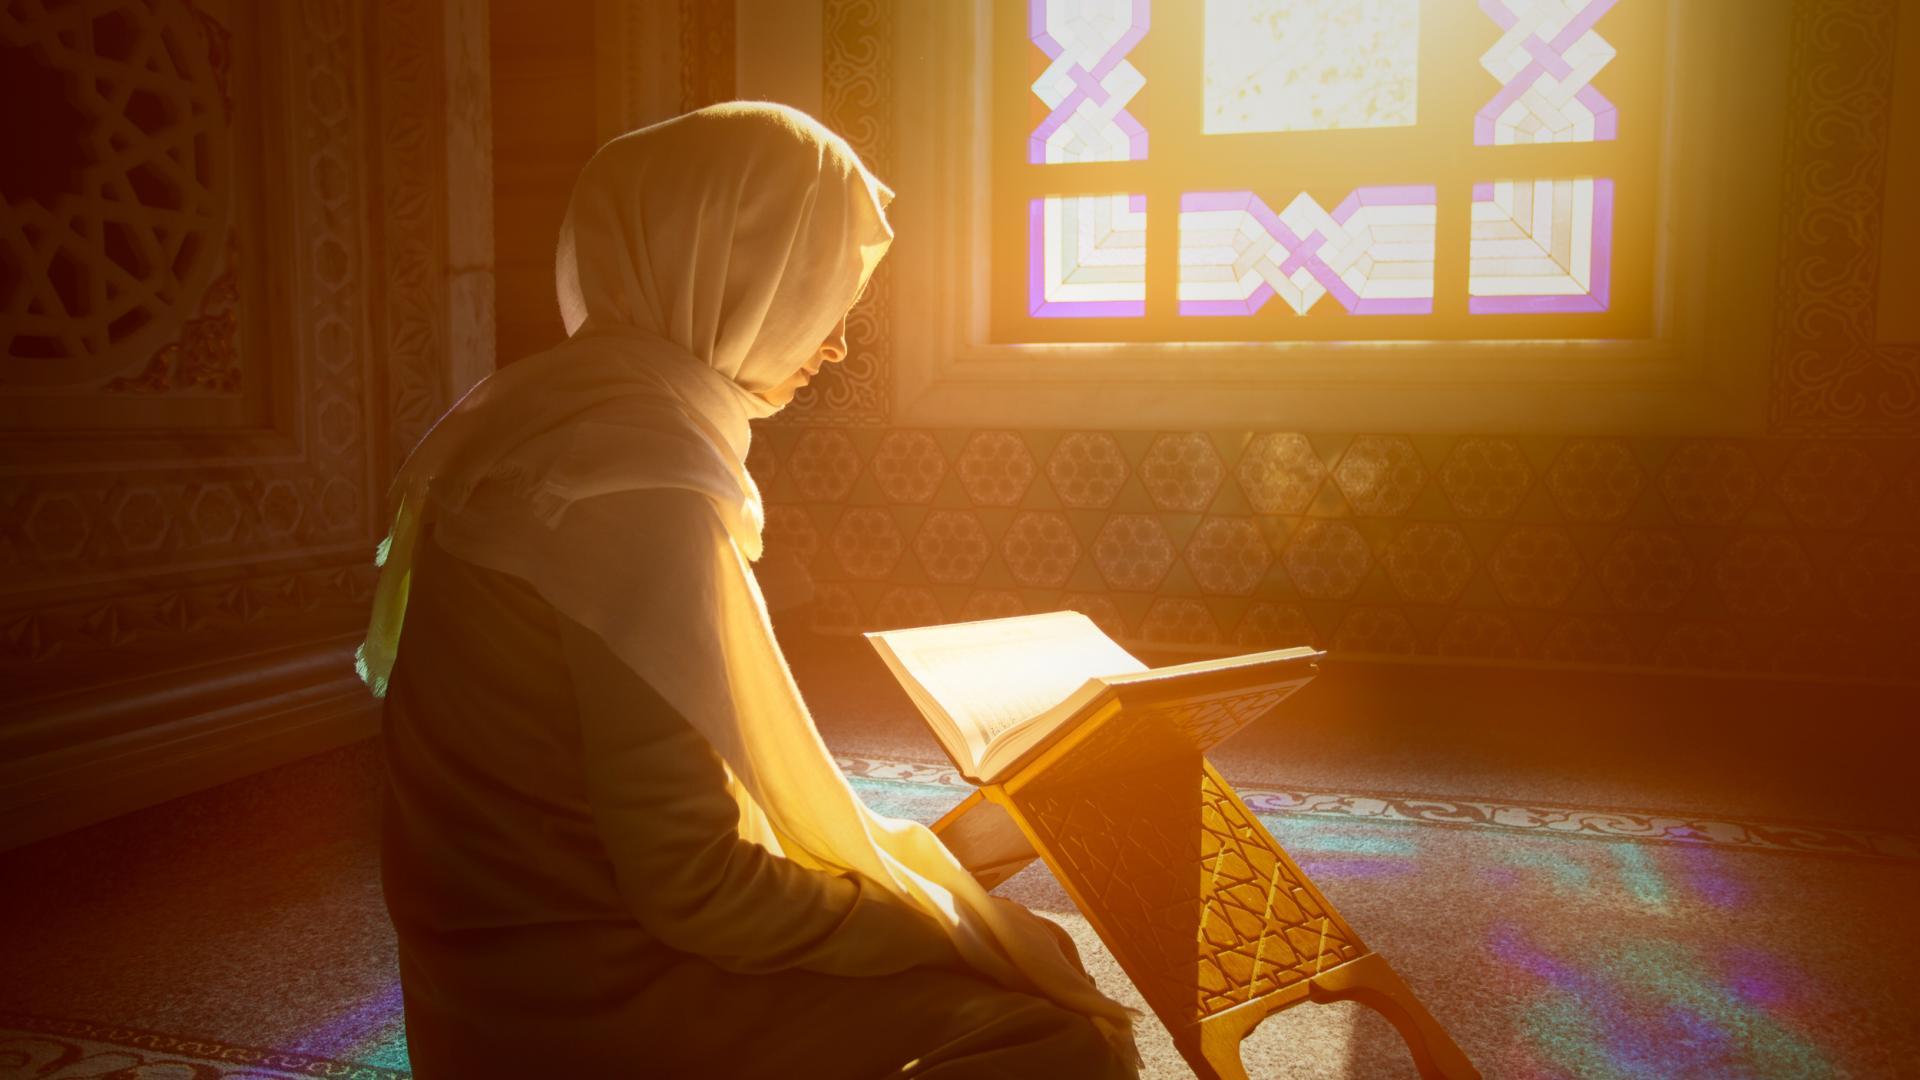 Muslima betet